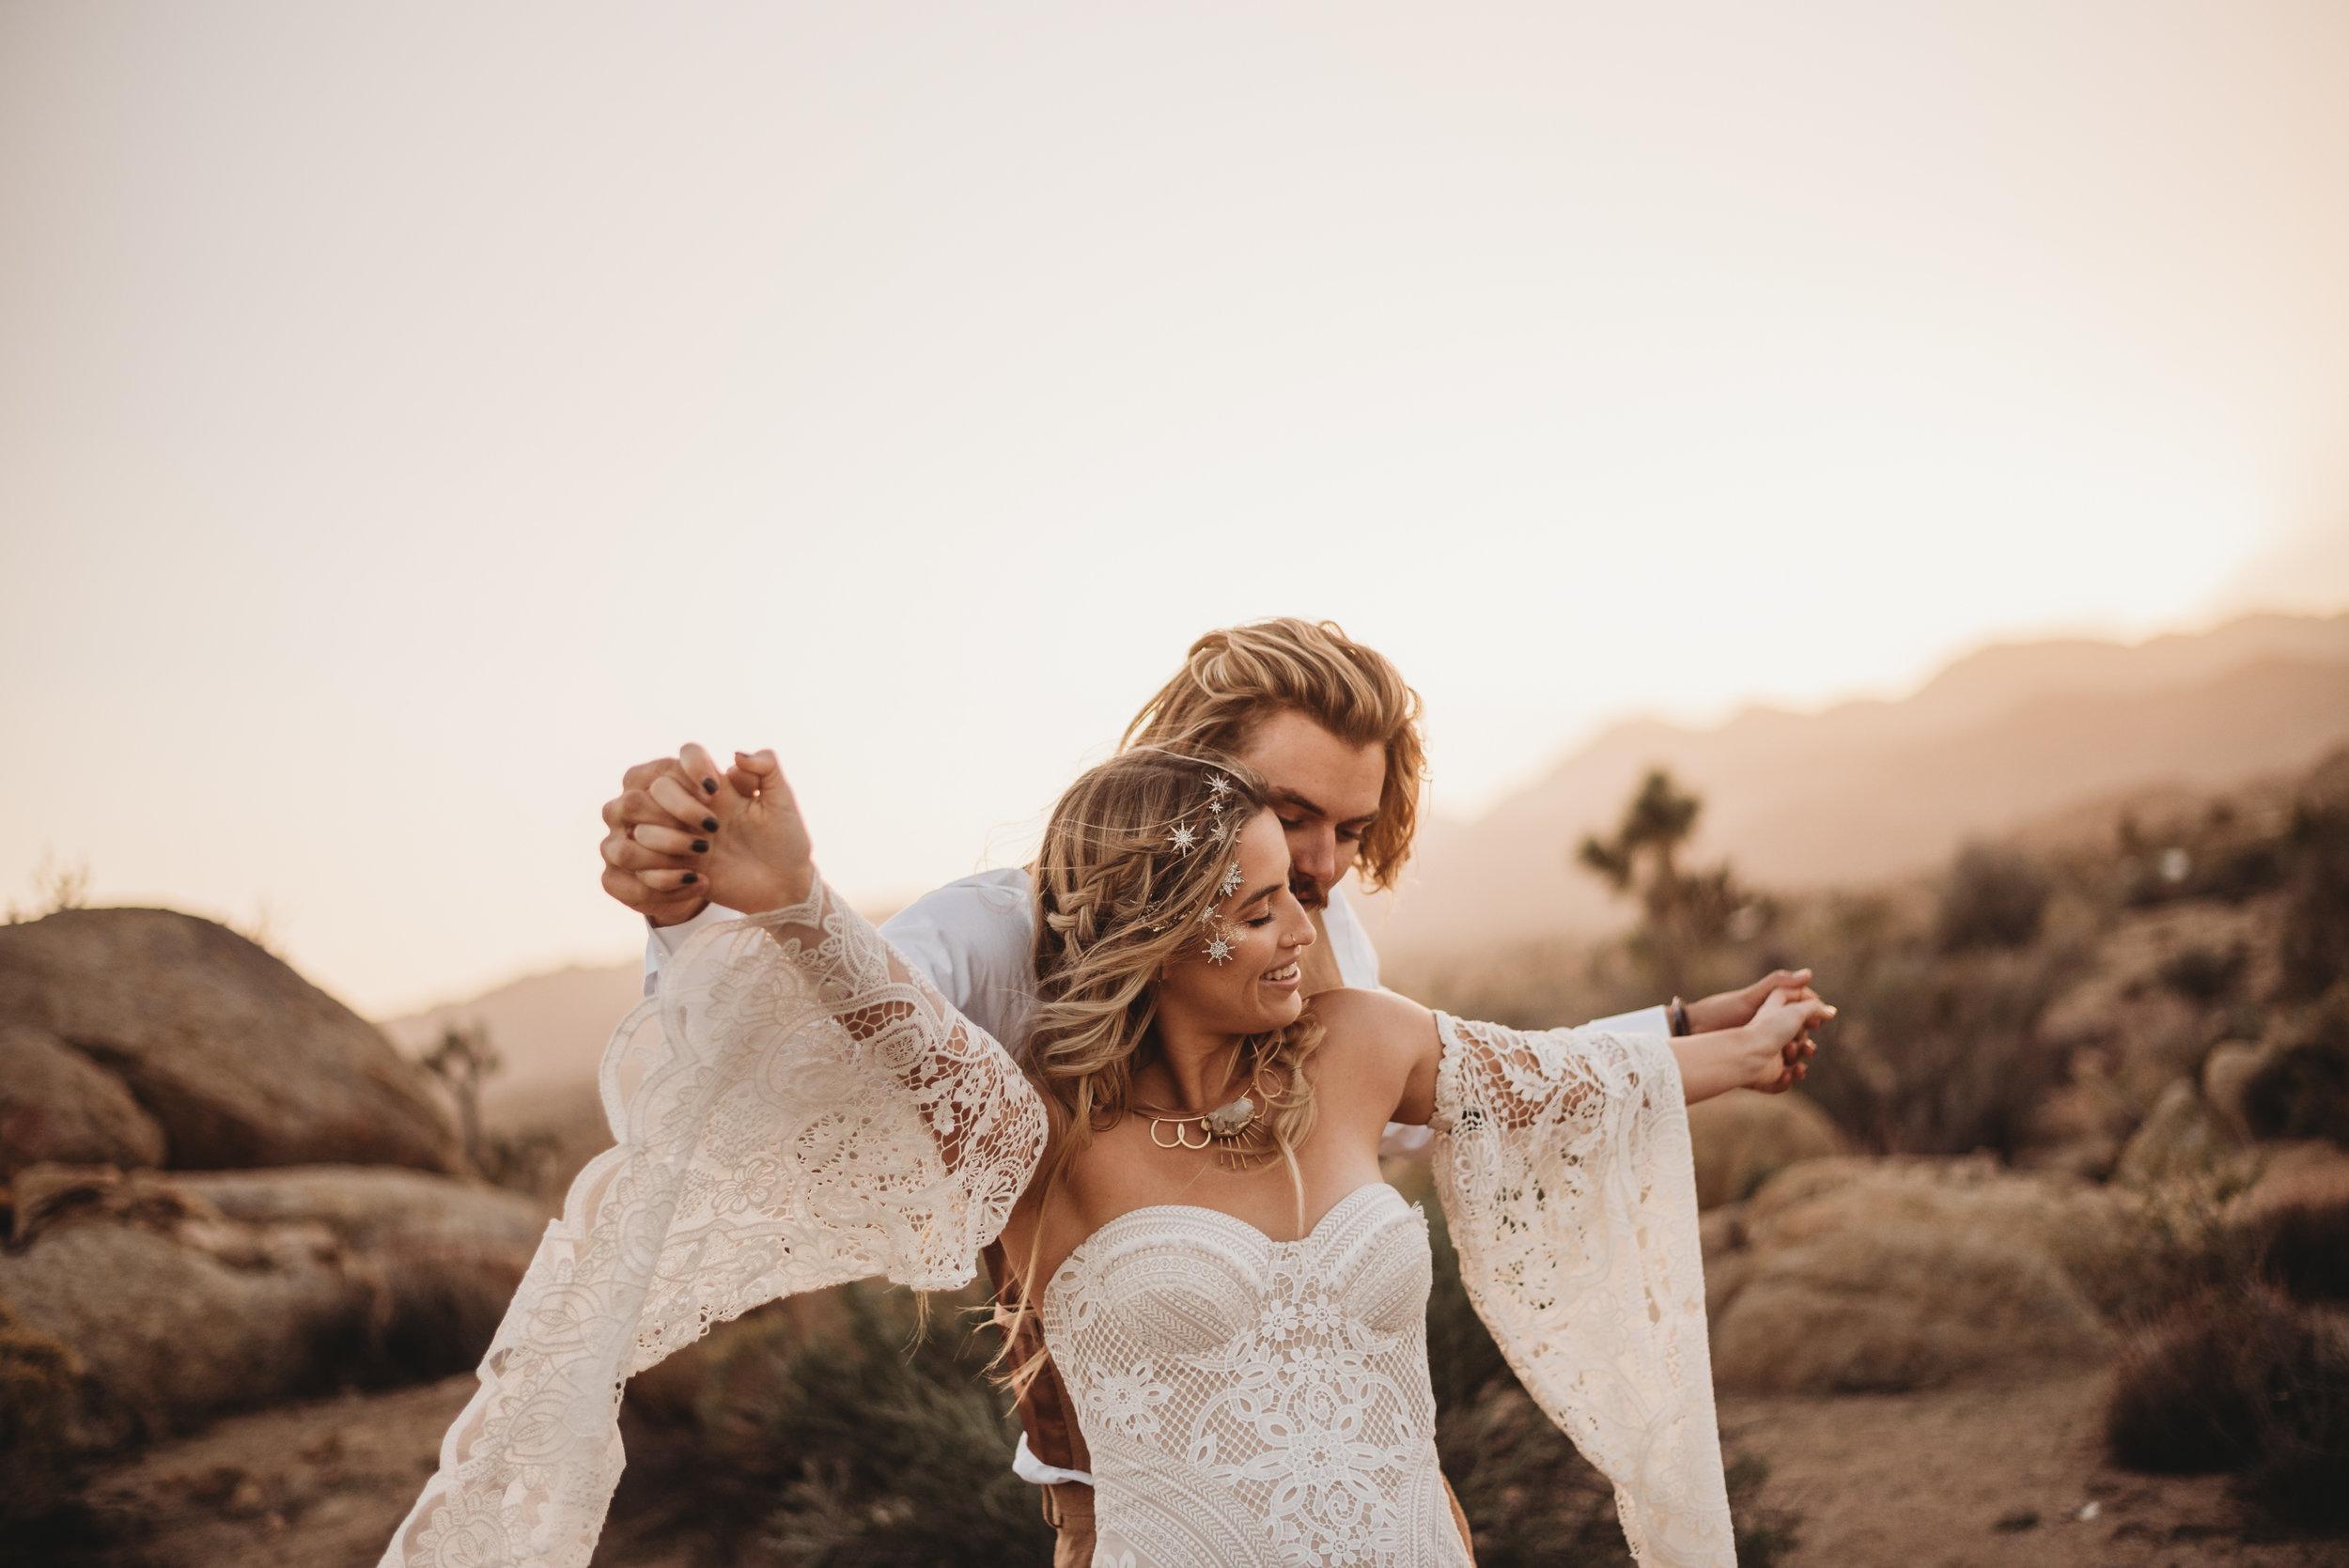 FortSt.John_photographer_TyraEPhotography_Wedding_Couple_Family_Photograhy_DawsonCreek_Elopement_Bride_Boduoir_Portraits-8643.jpg